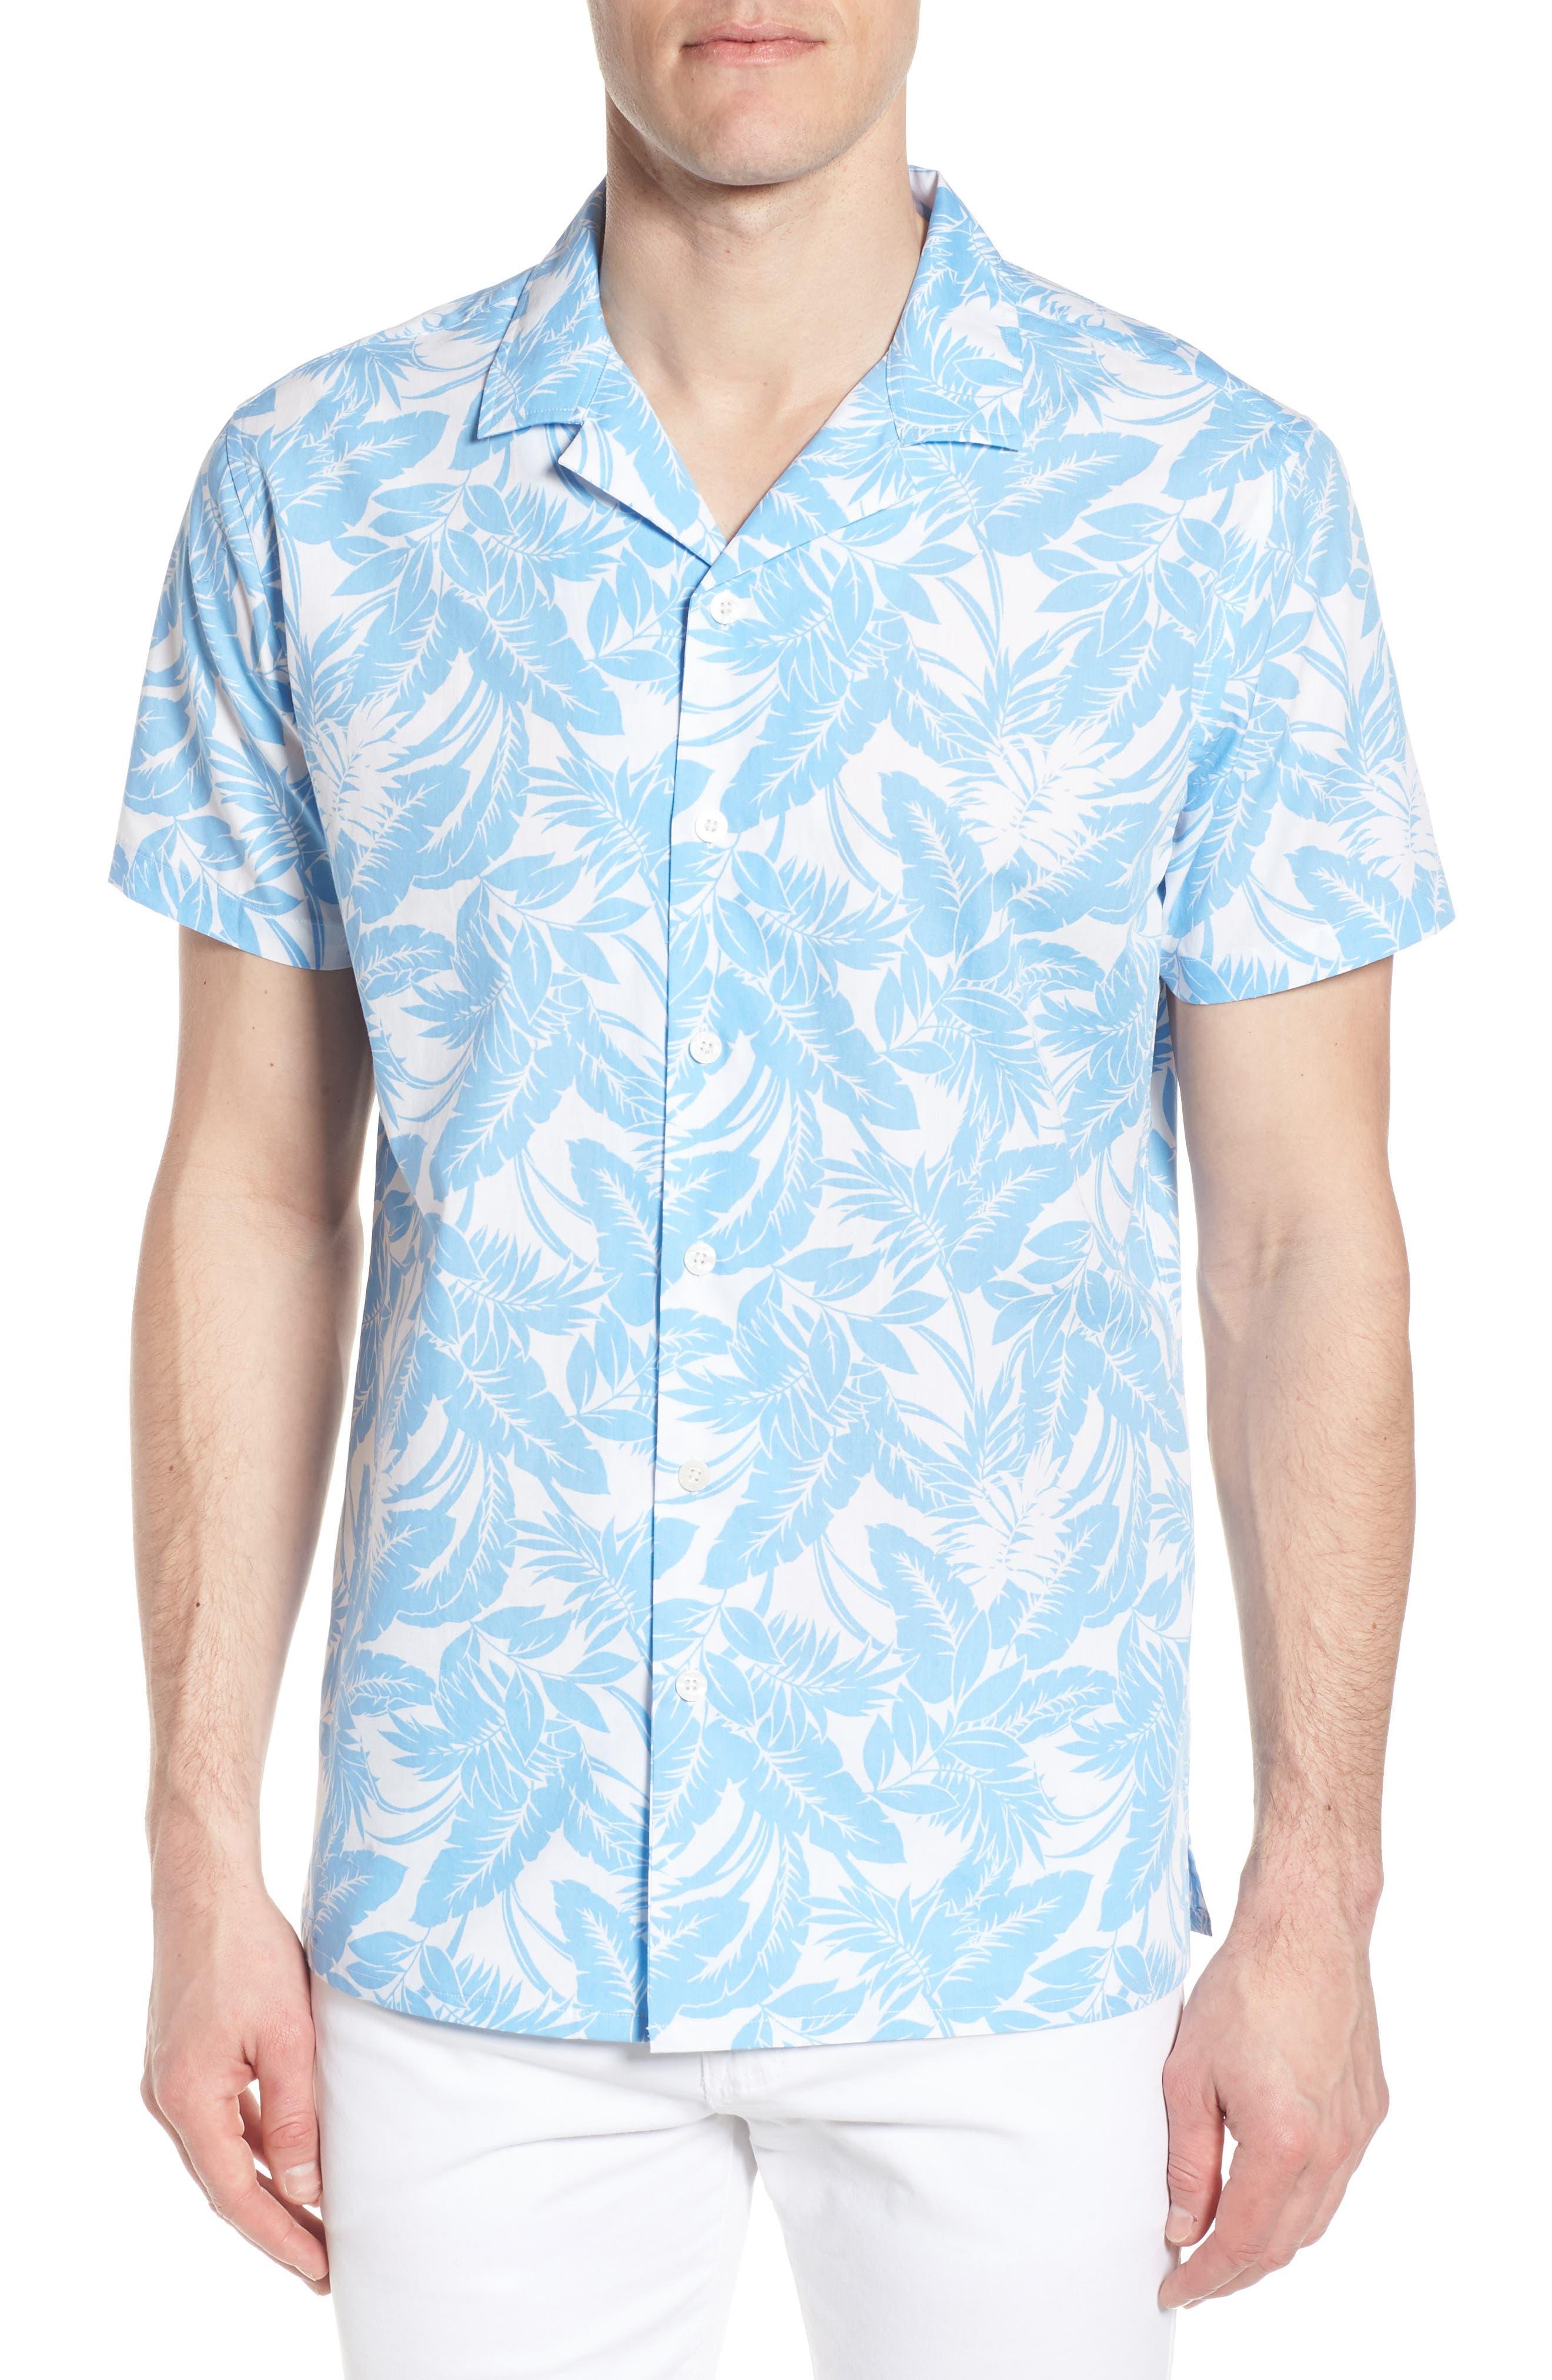 Camp Ventu Regular Fit Short Sleeve Sport Shirt,                         Main,                         color, Sky